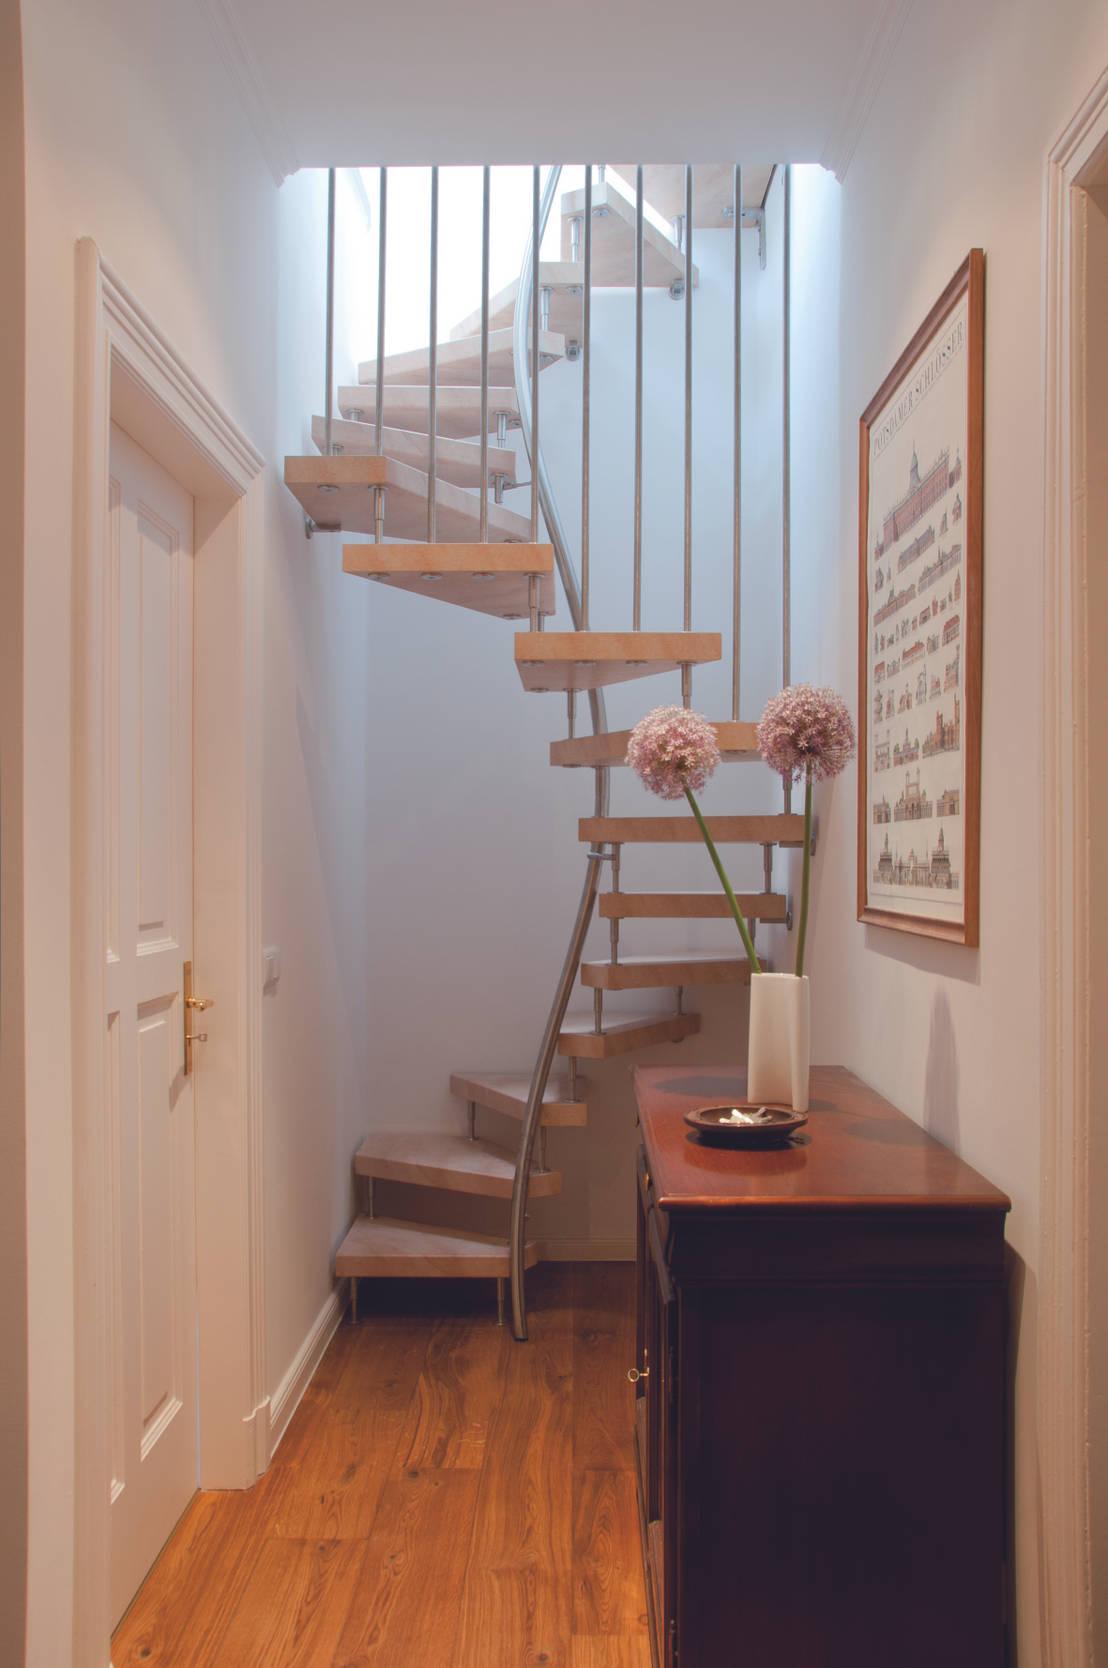 kenngott 1qm treppe 3660 1 di kenngott treppen longlife. Black Bedroom Furniture Sets. Home Design Ideas